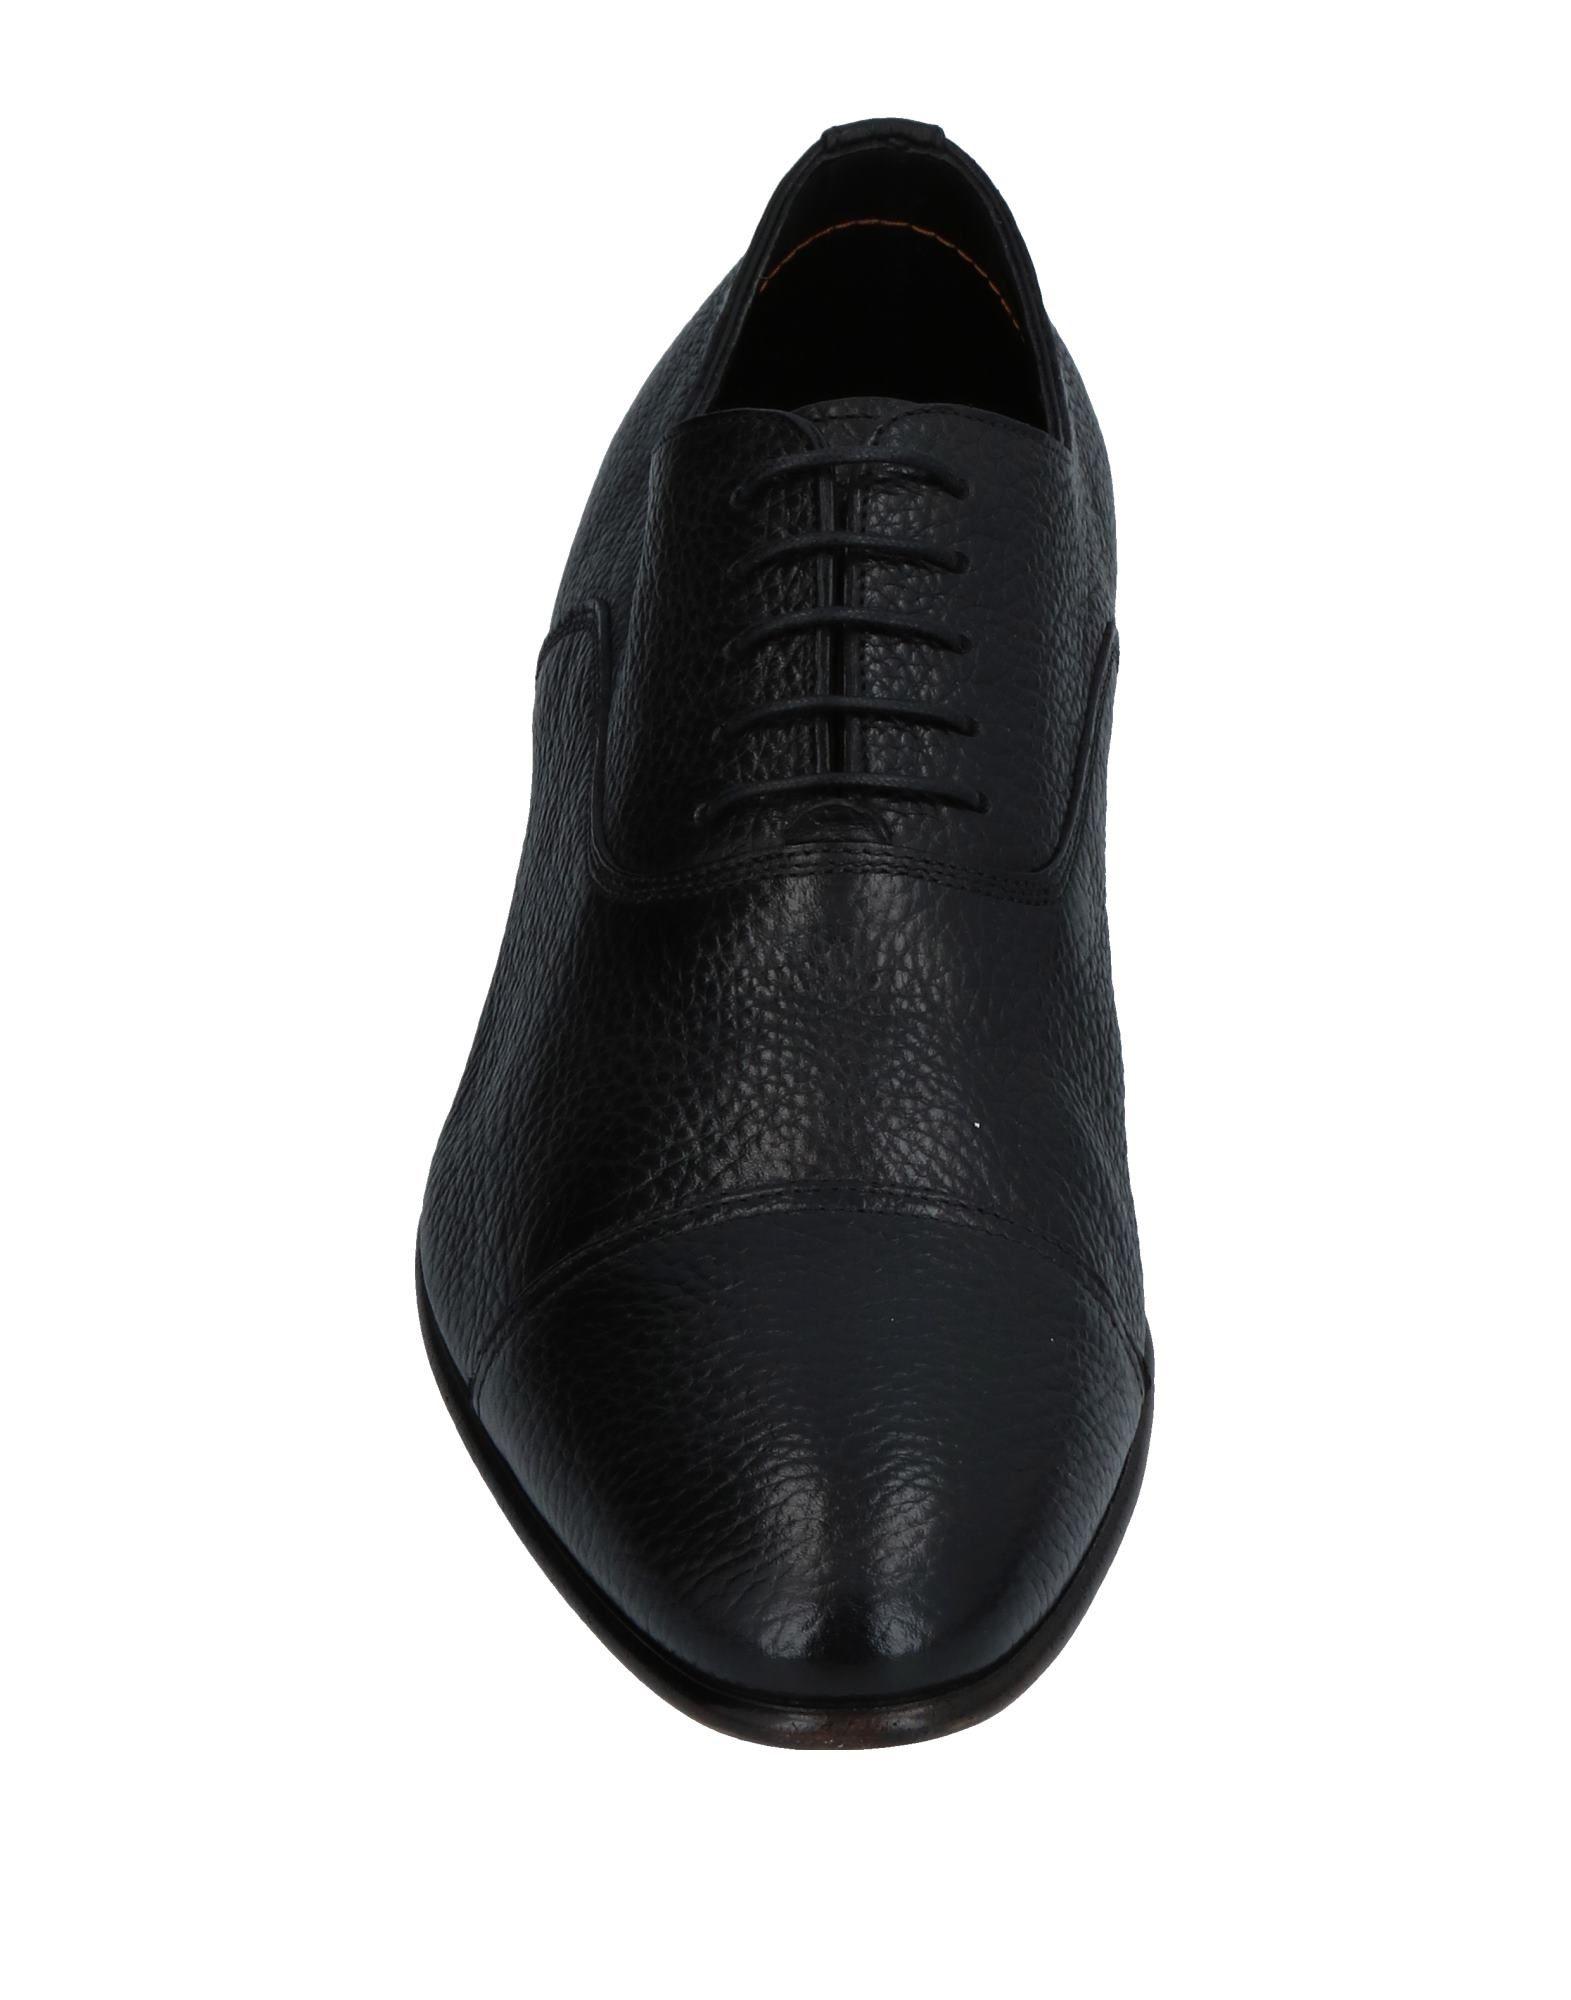 Santoni 11410457MQ Schnürschuhe Herren  11410457MQ Santoni Heiße Schuhe fe0c5a